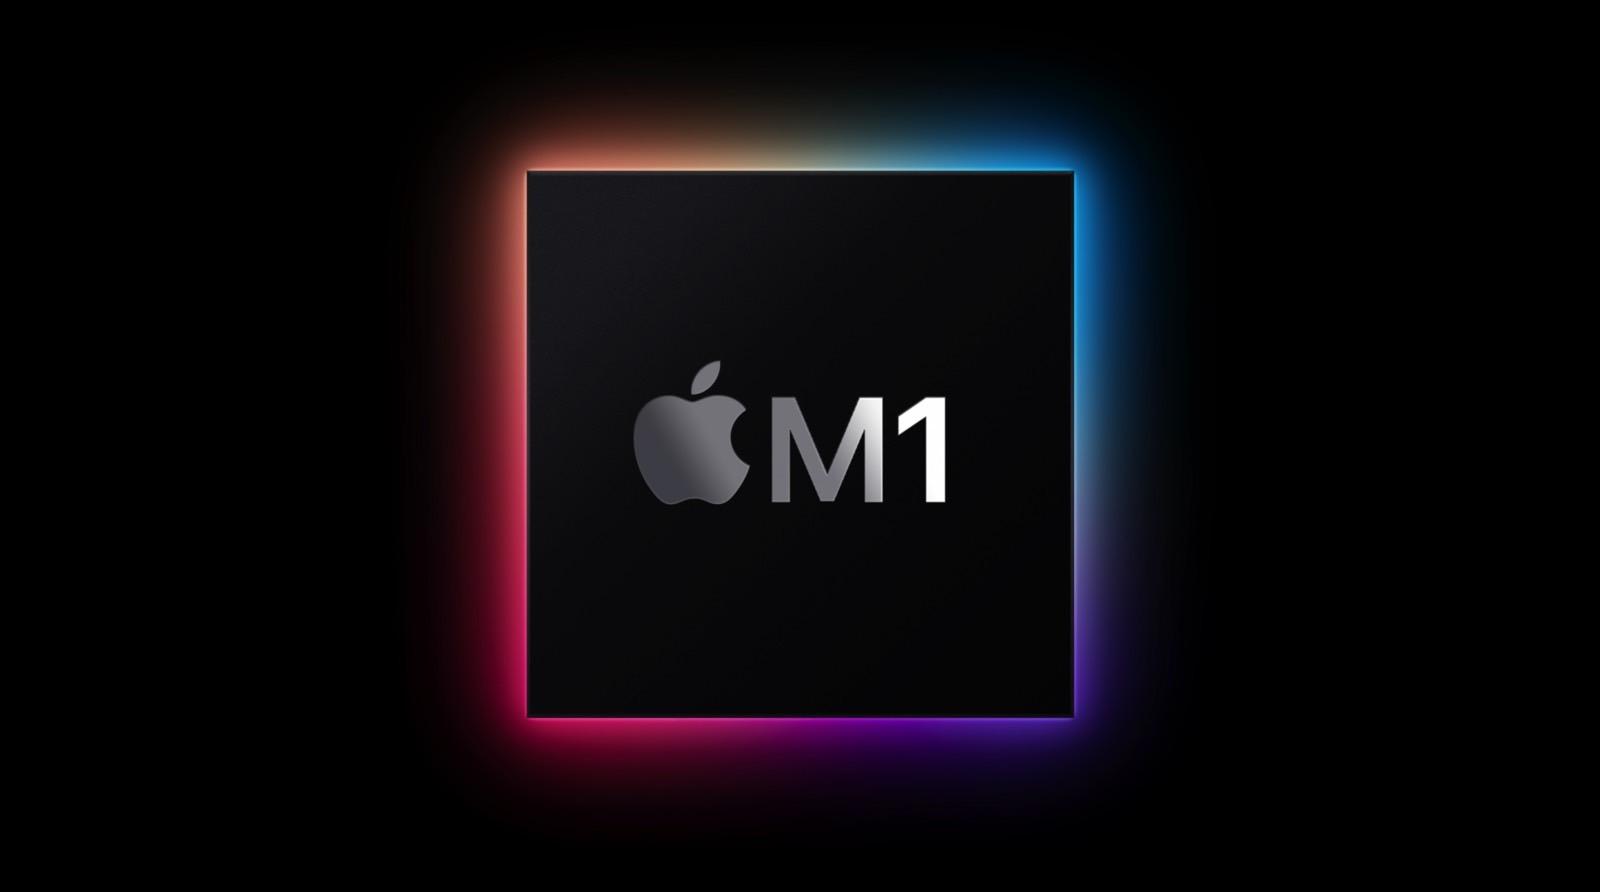 Apple's new M1 MacBook Pro